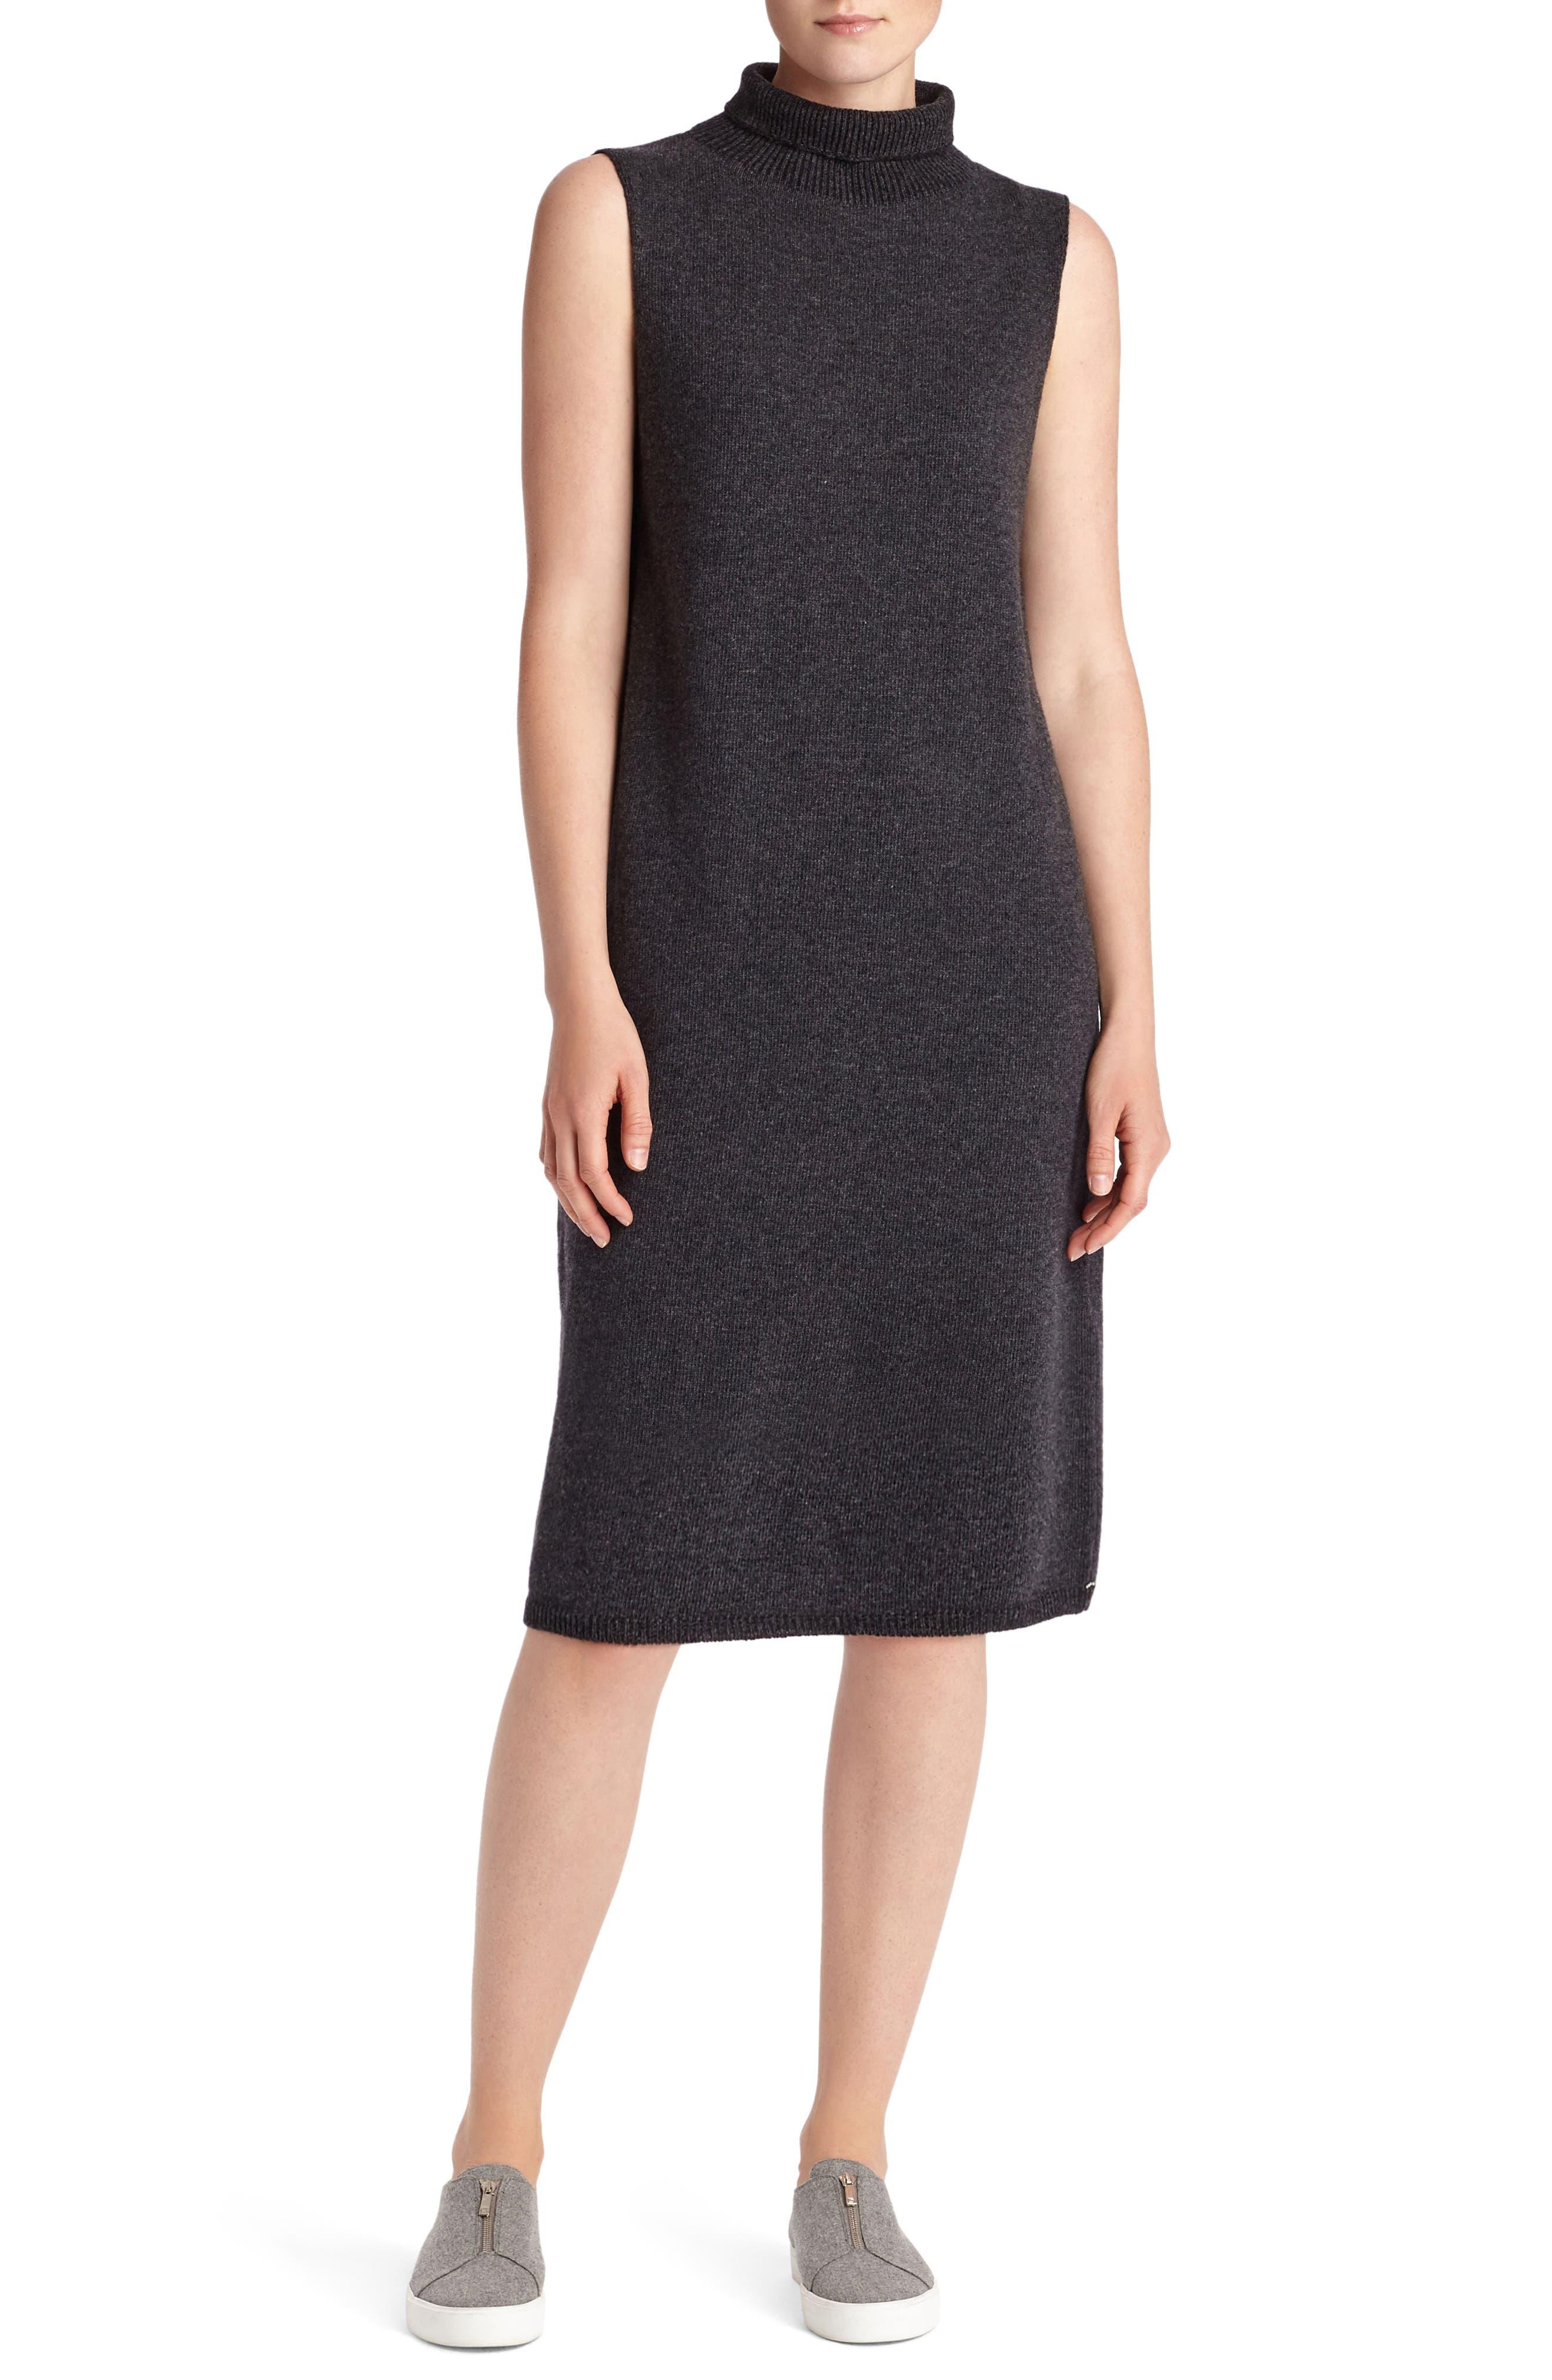 Alternate Image 1 Selected - Lafayette 148 New York Vanise Merino Wool & Cashmere Sweater Dress